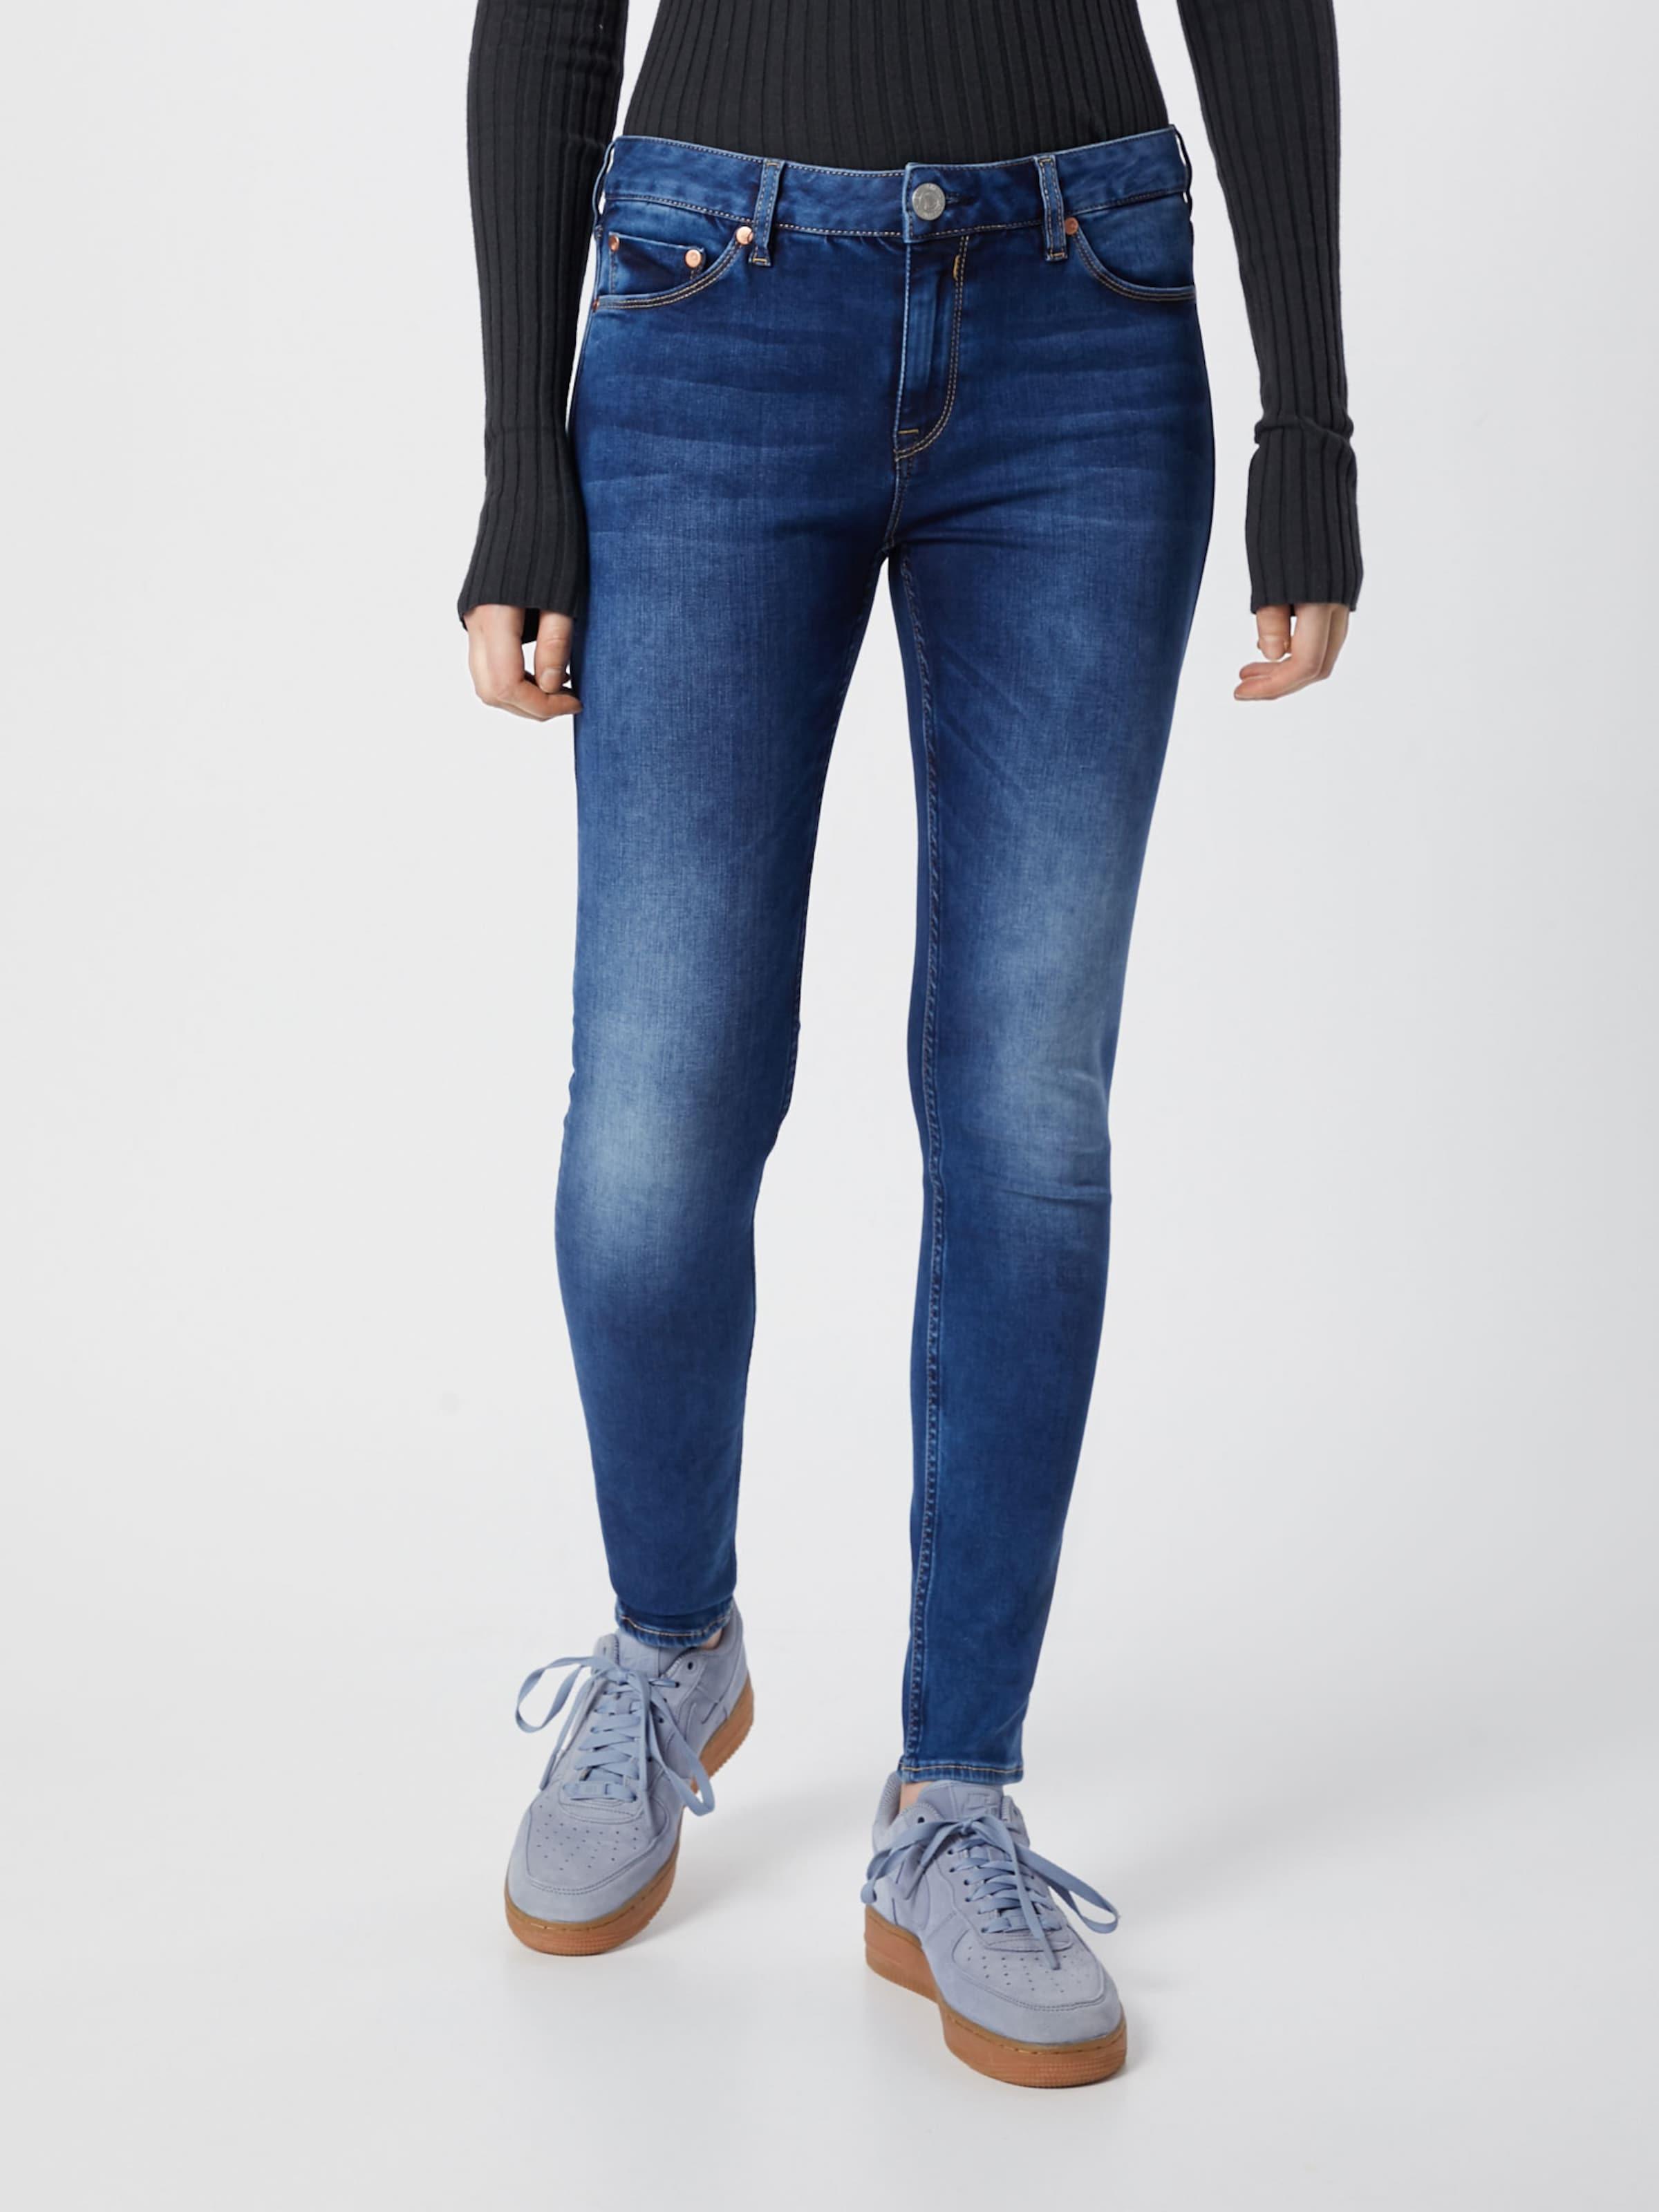 'superslim Denim Jeans Powerstretch' Blau In Herrlicher LSAc3Rq4j5